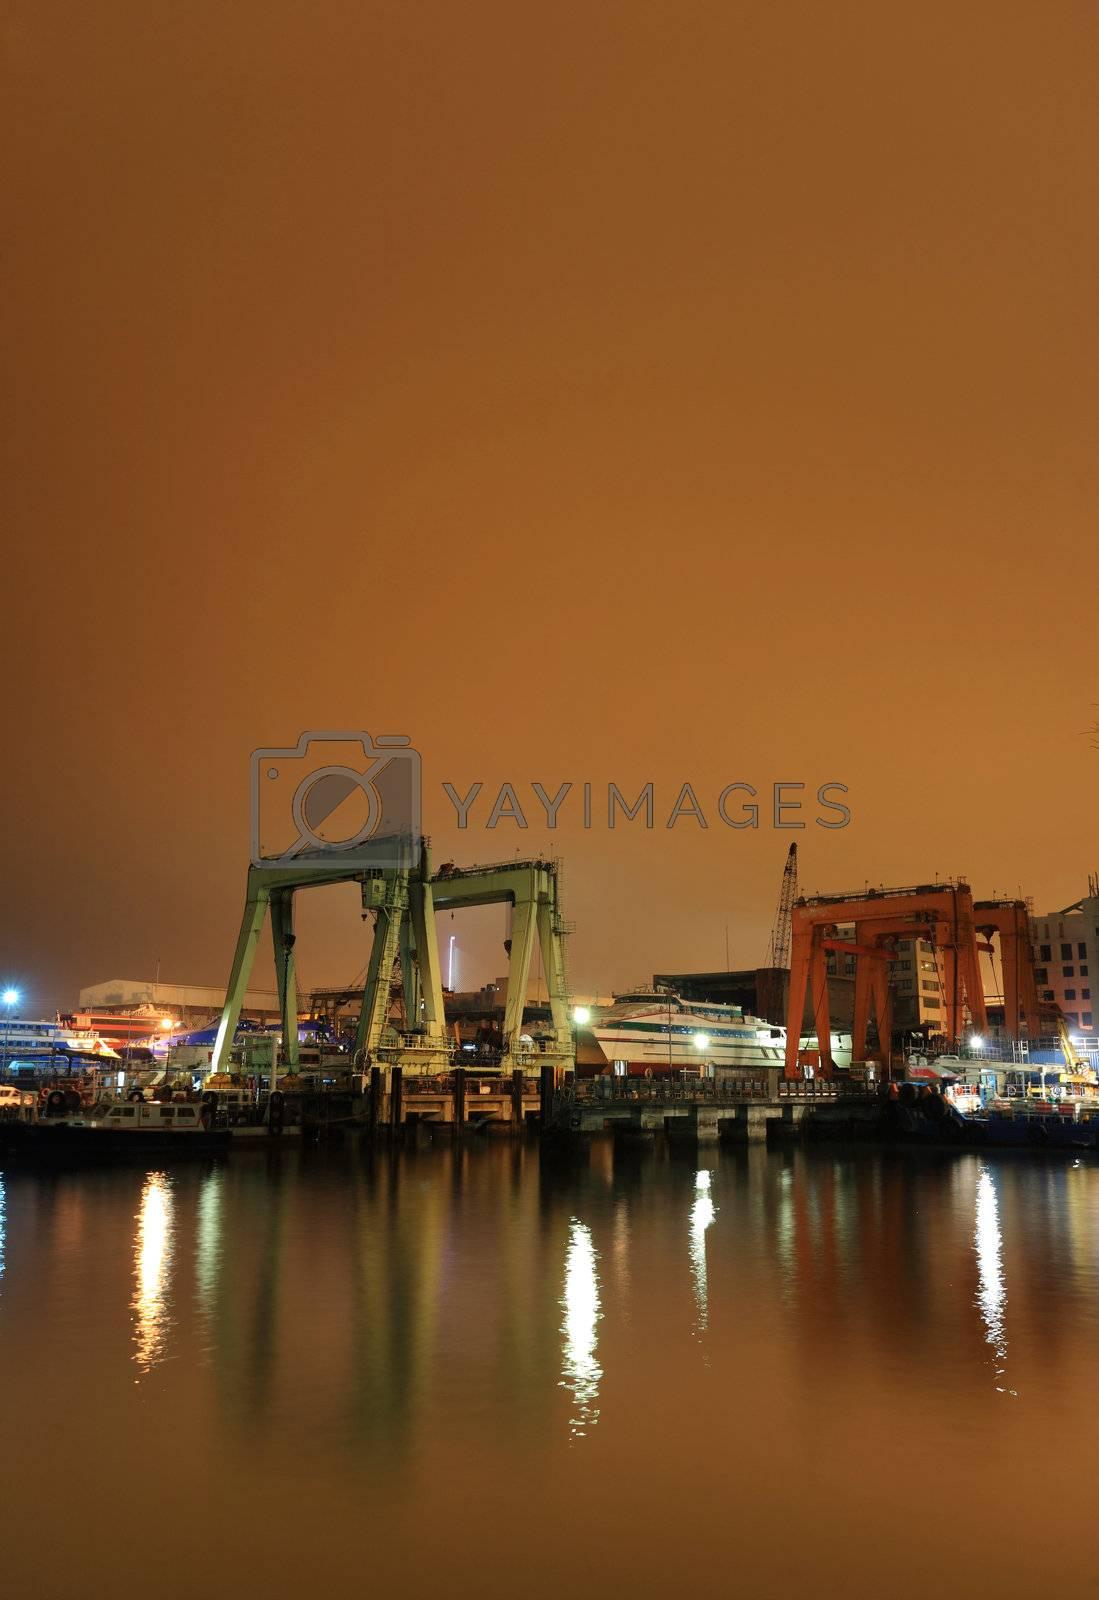 Royalty free image of dock at night by leungchopan